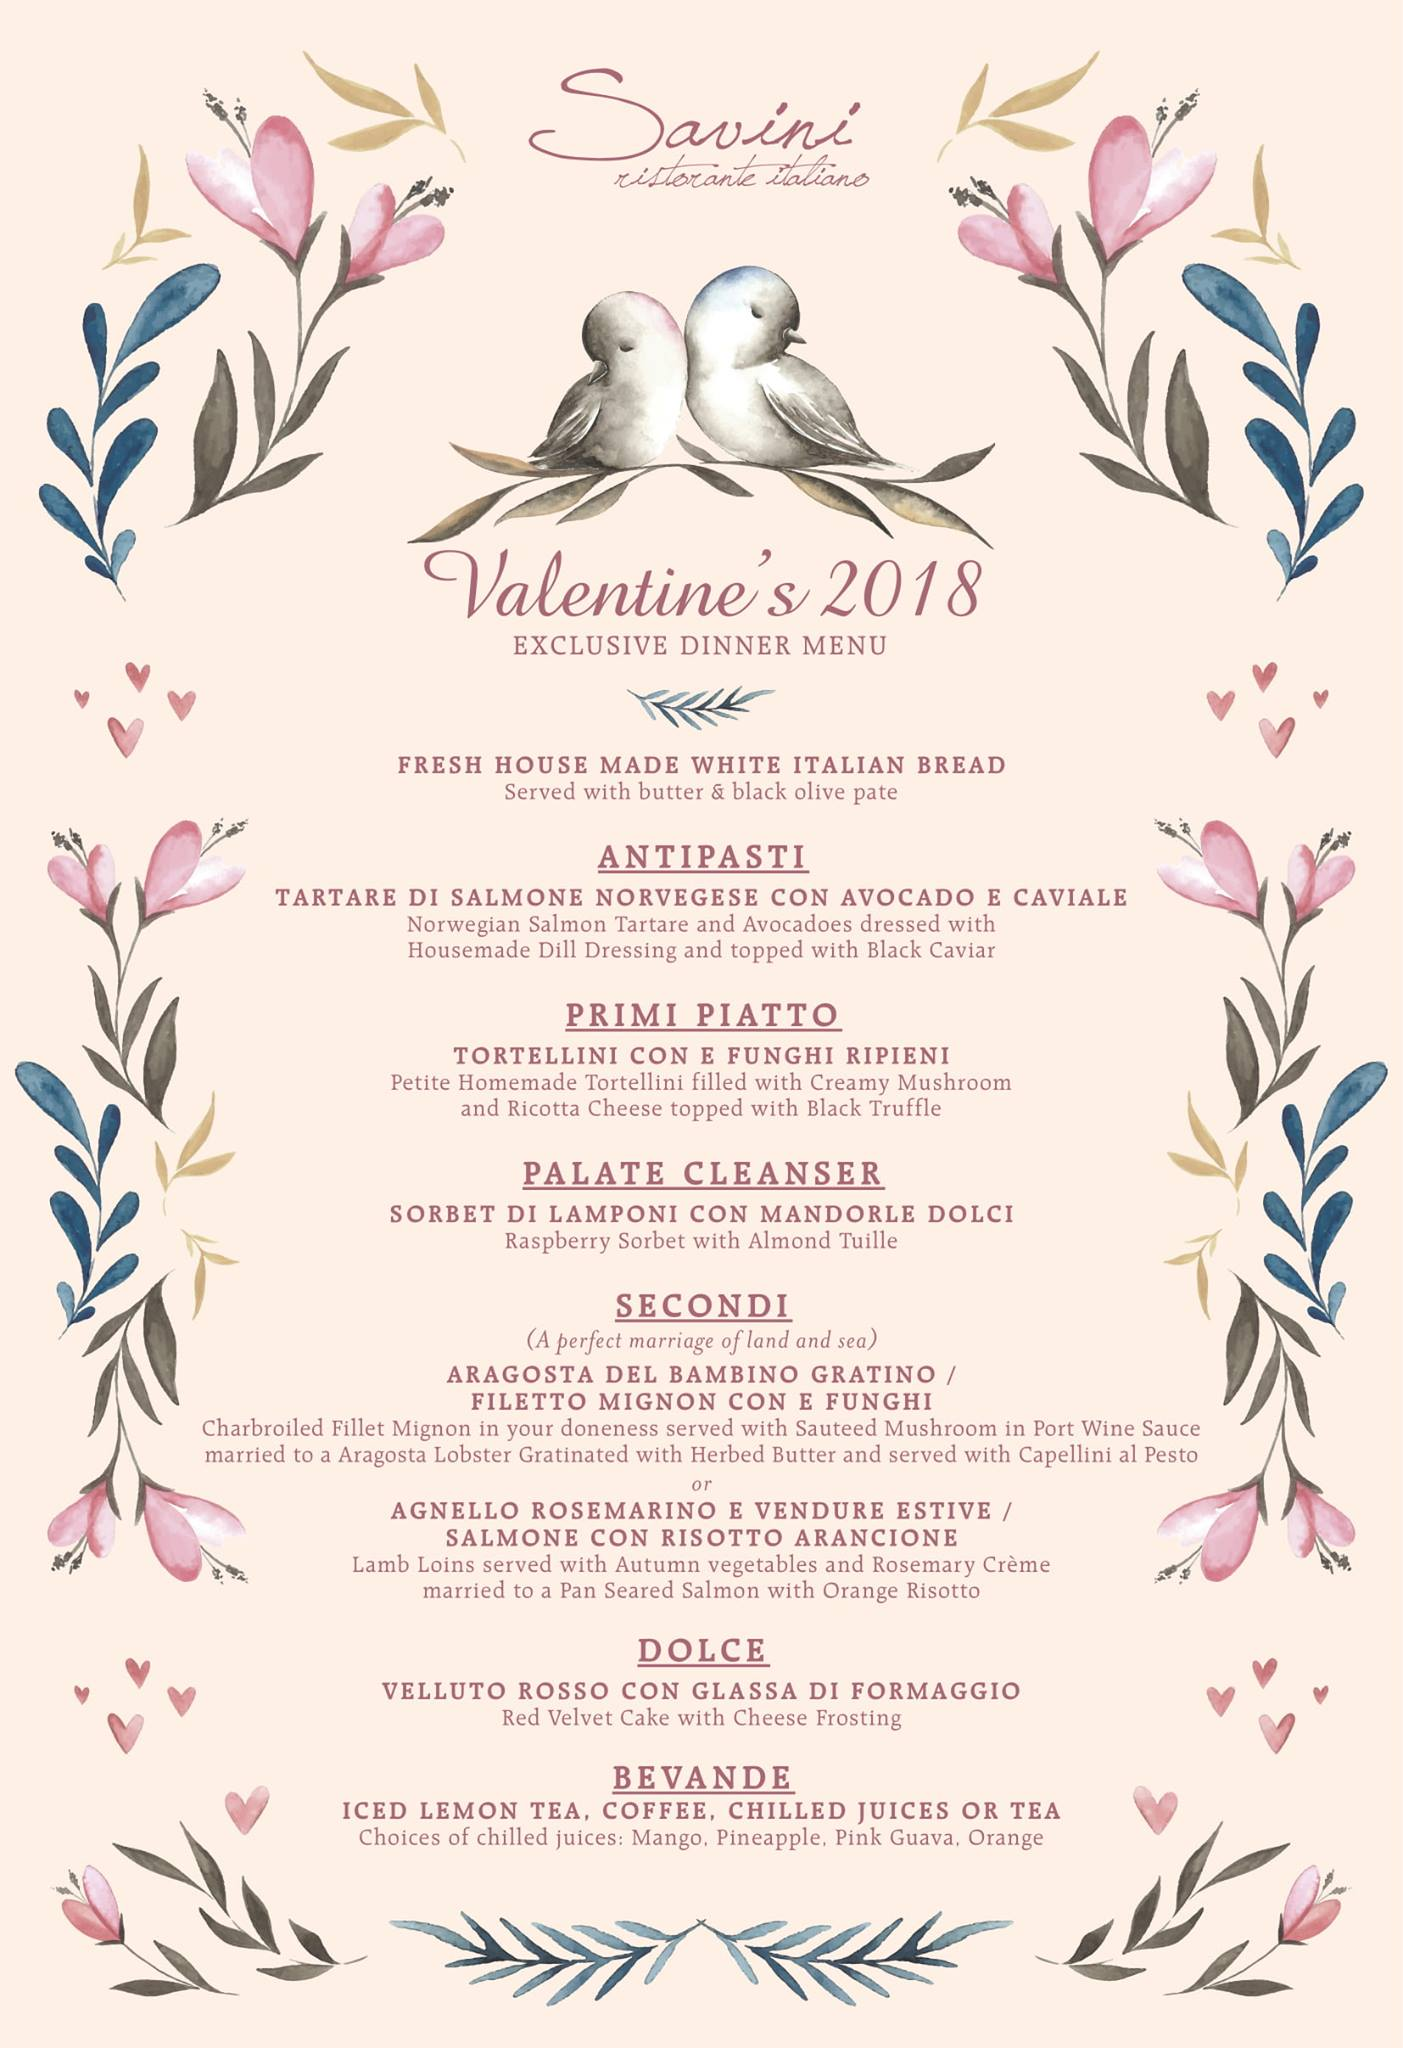 Valentine S Day 2018 Romantic Dinners In Kuala Lumpur Klang